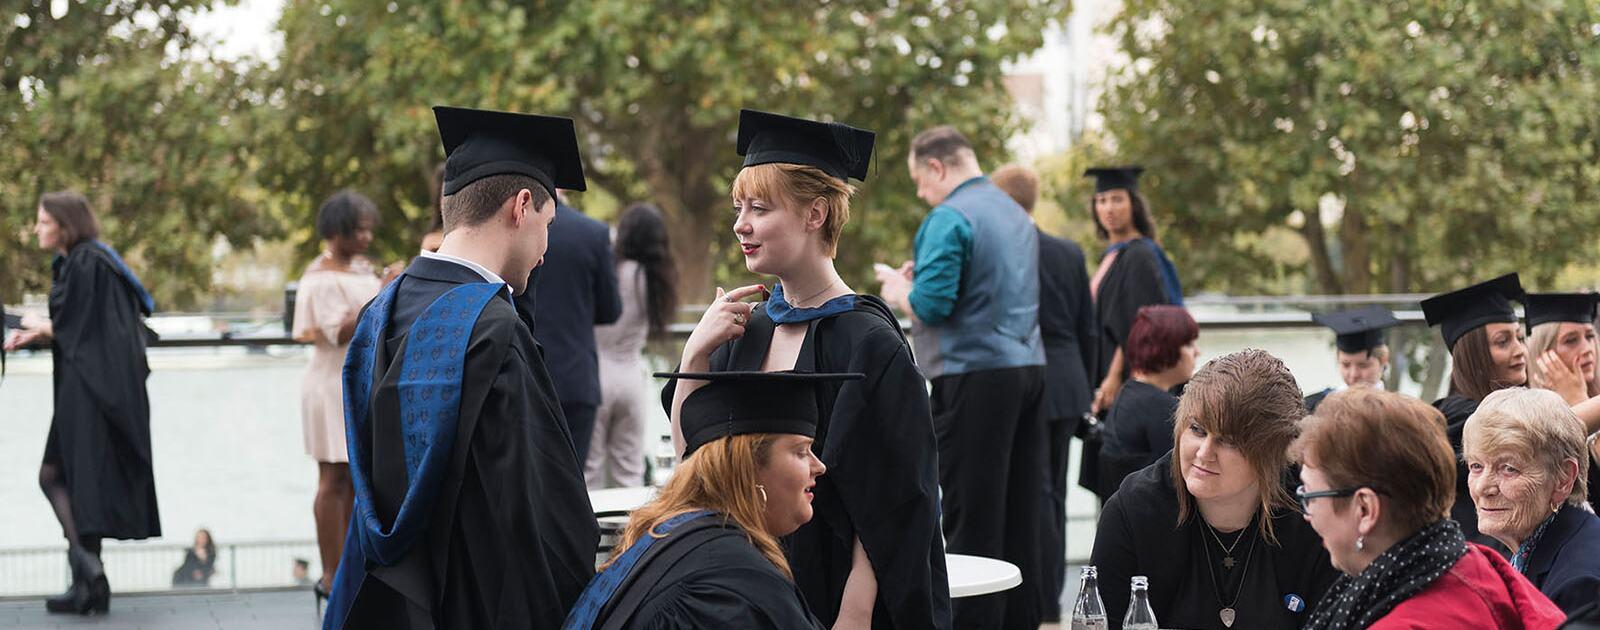 Graduates at Royal Festival Hall terrace